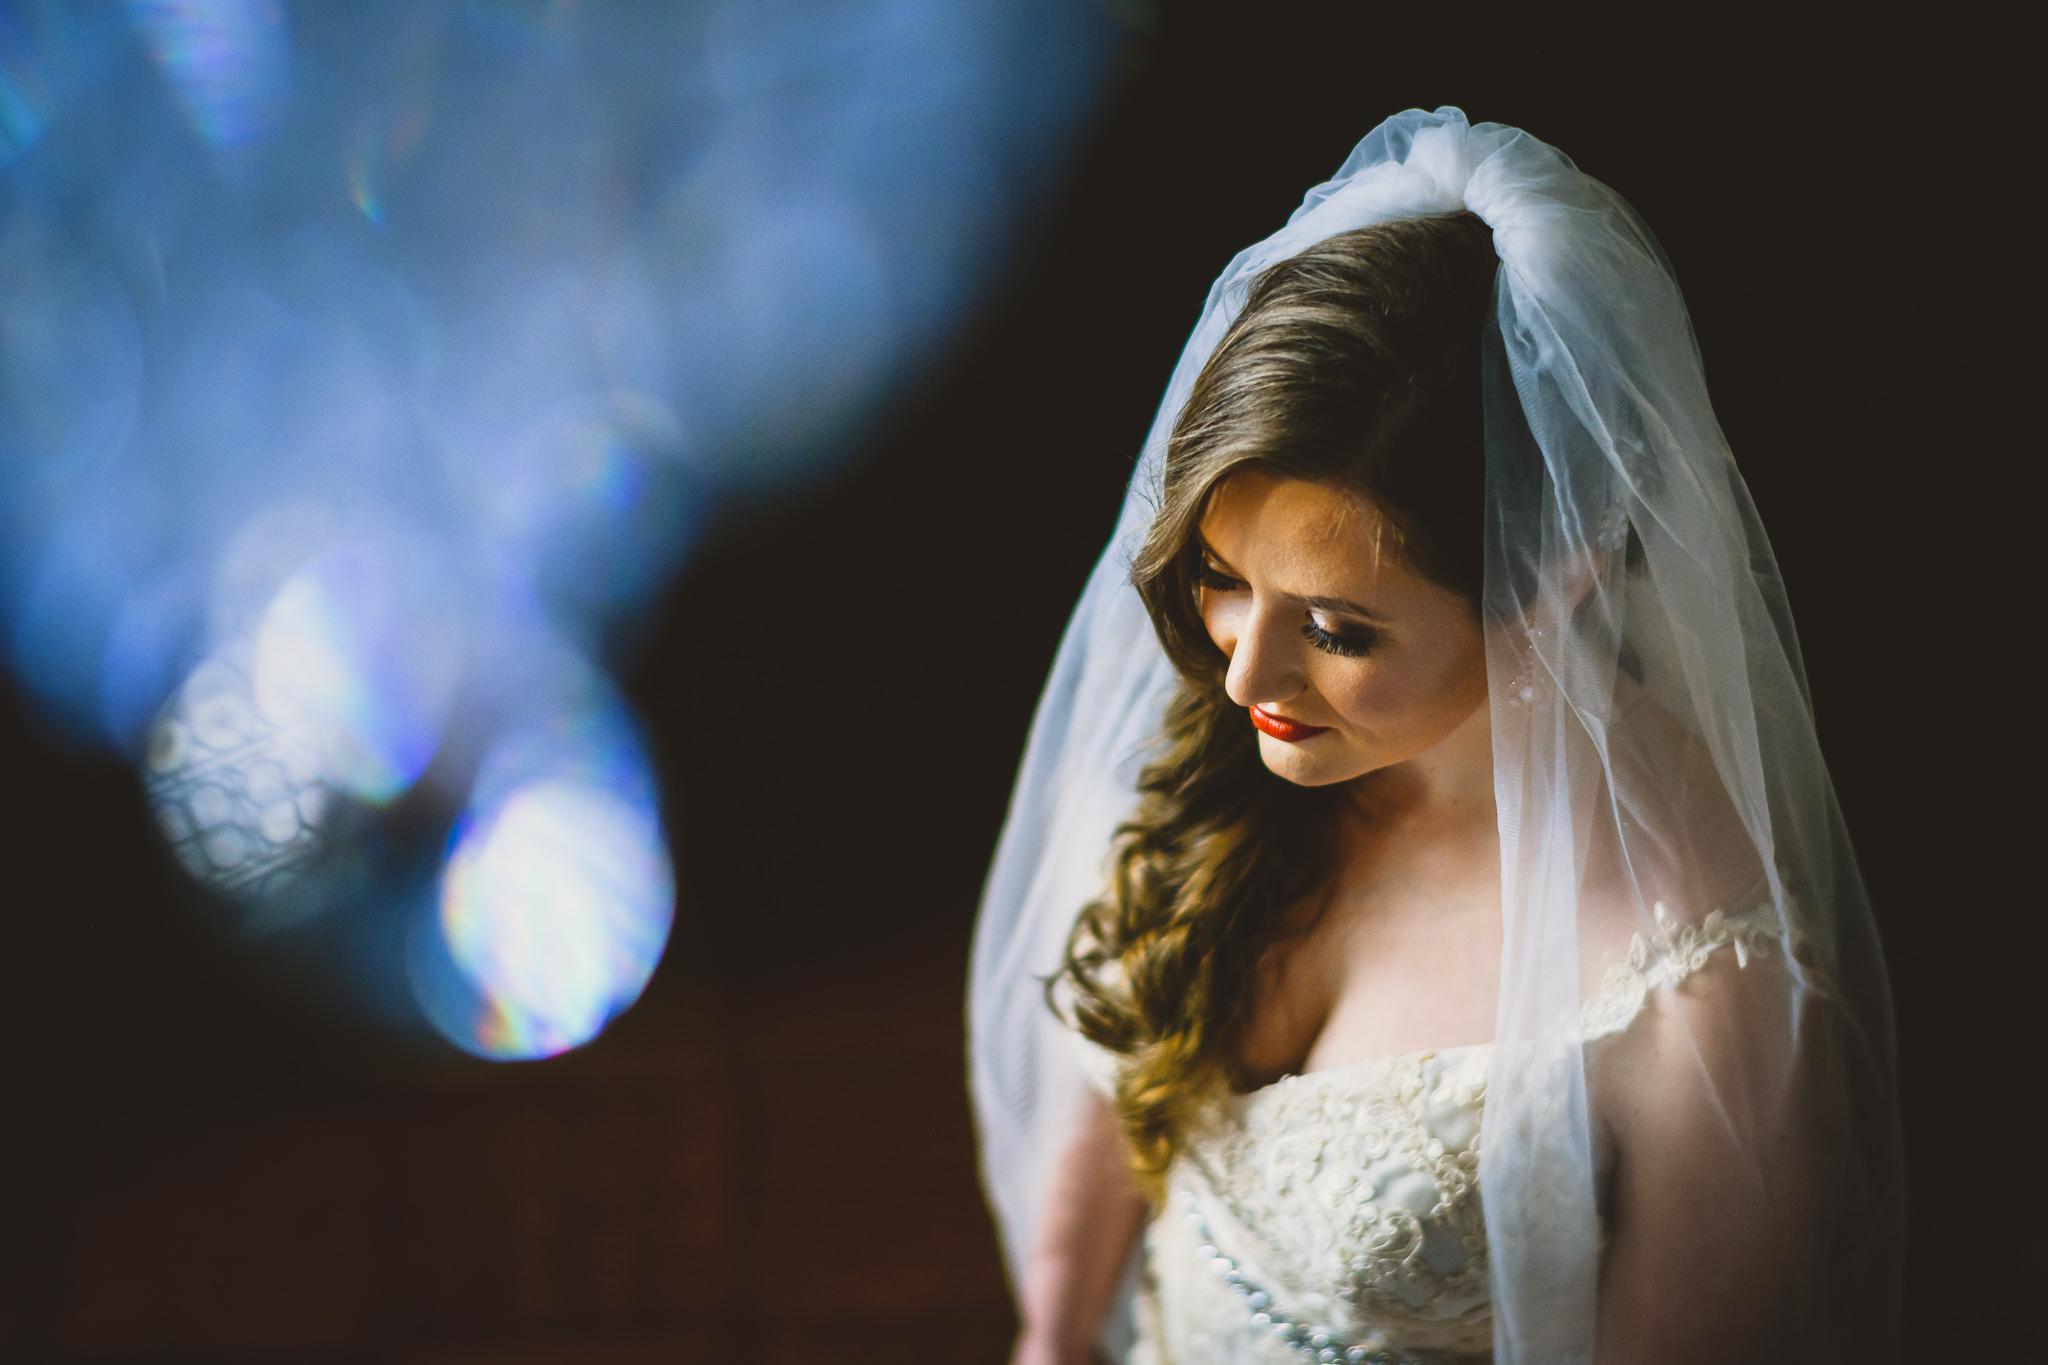 Colonial_Dames_Society_Wedding-0009.jpg